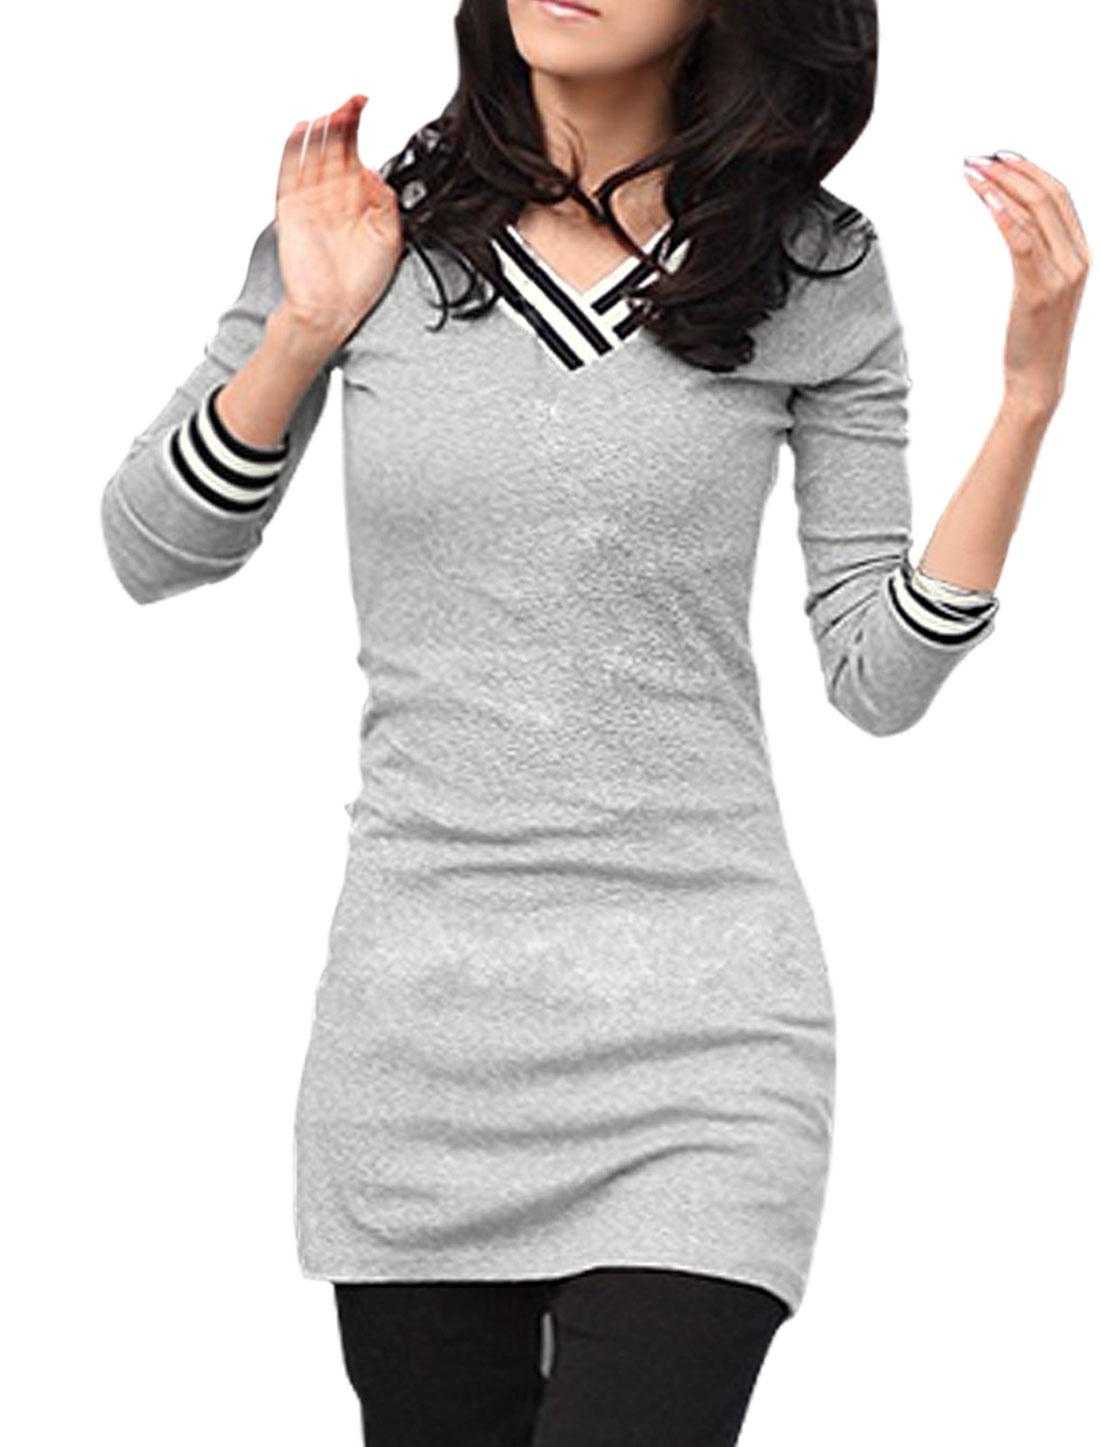 Lady Slipover Slim Fit V Neck Design Light Gray Tunic Shirt XL